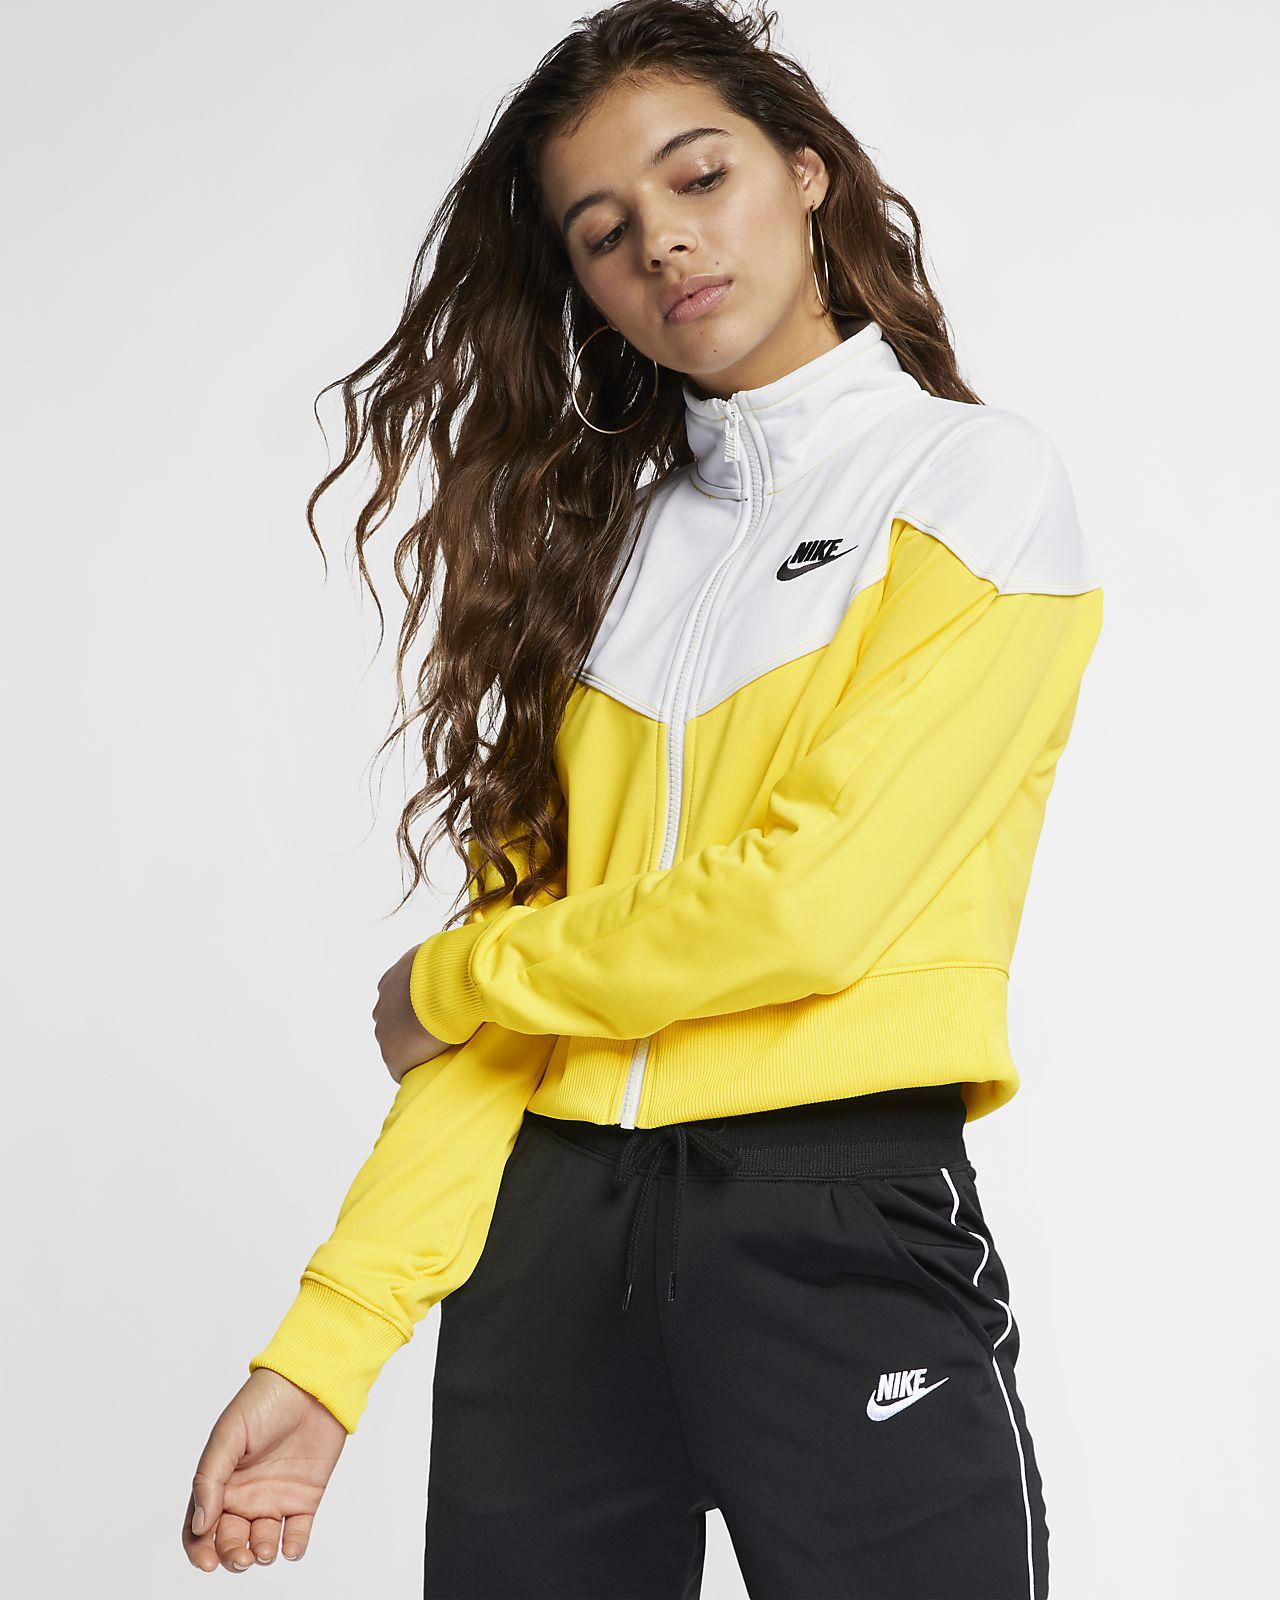 0ab2ae0b48 Nike Sportswear Windrunner Women s Knit Jacket. Nike.com AT